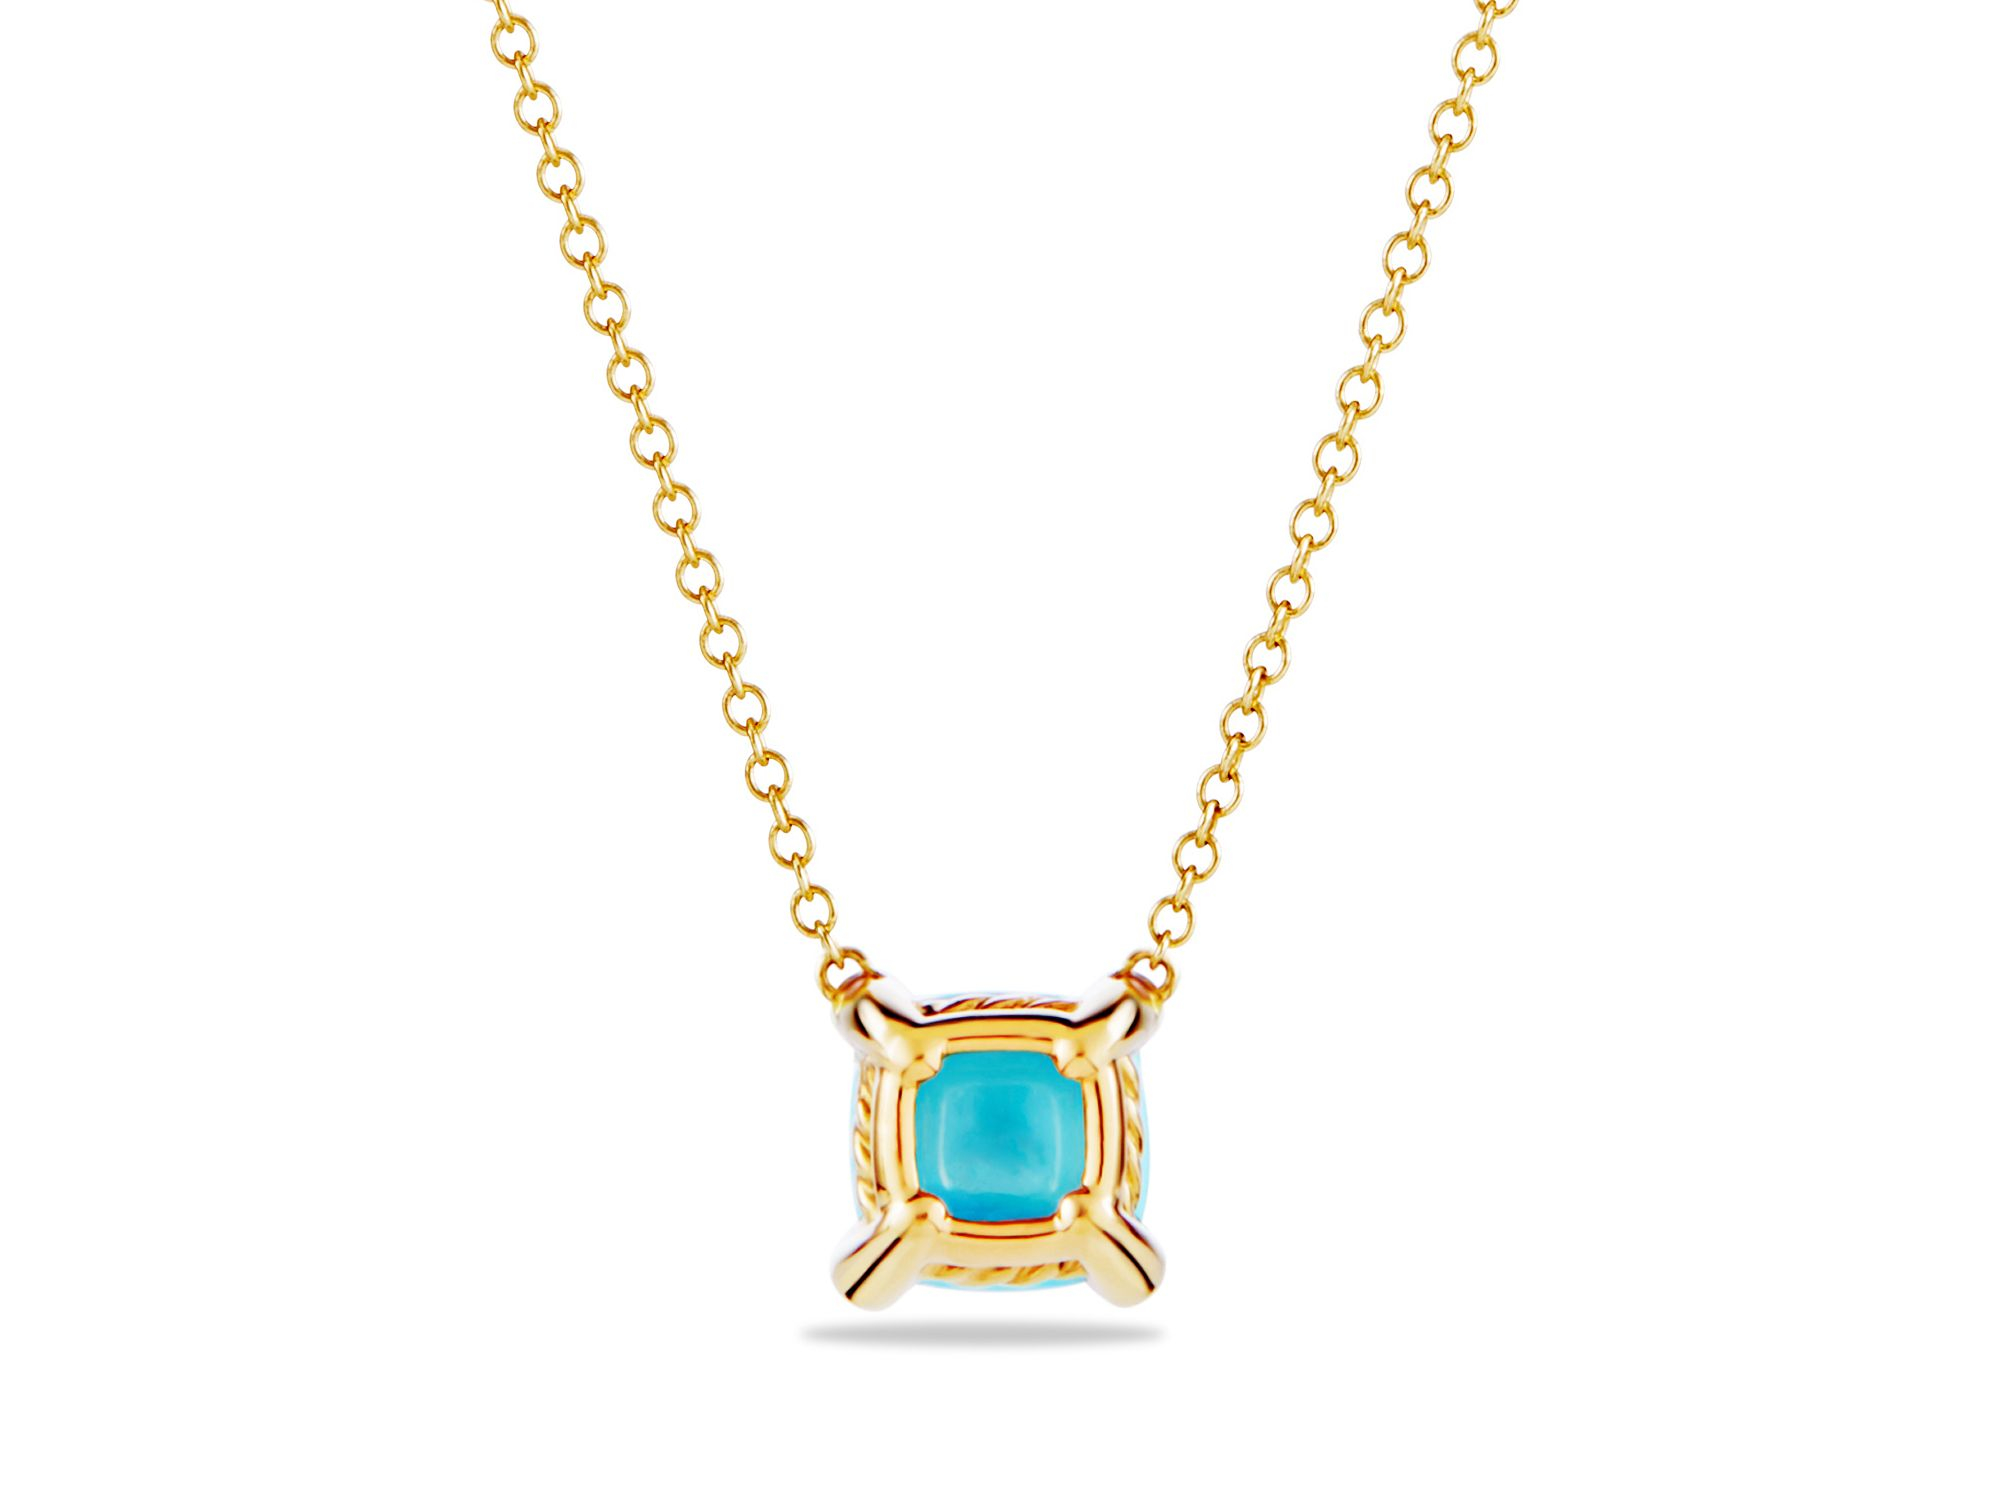 David Yurman 18kt yellow gold Châtelaine turquoise and diamond pendant necklace - Metallic c65oNm